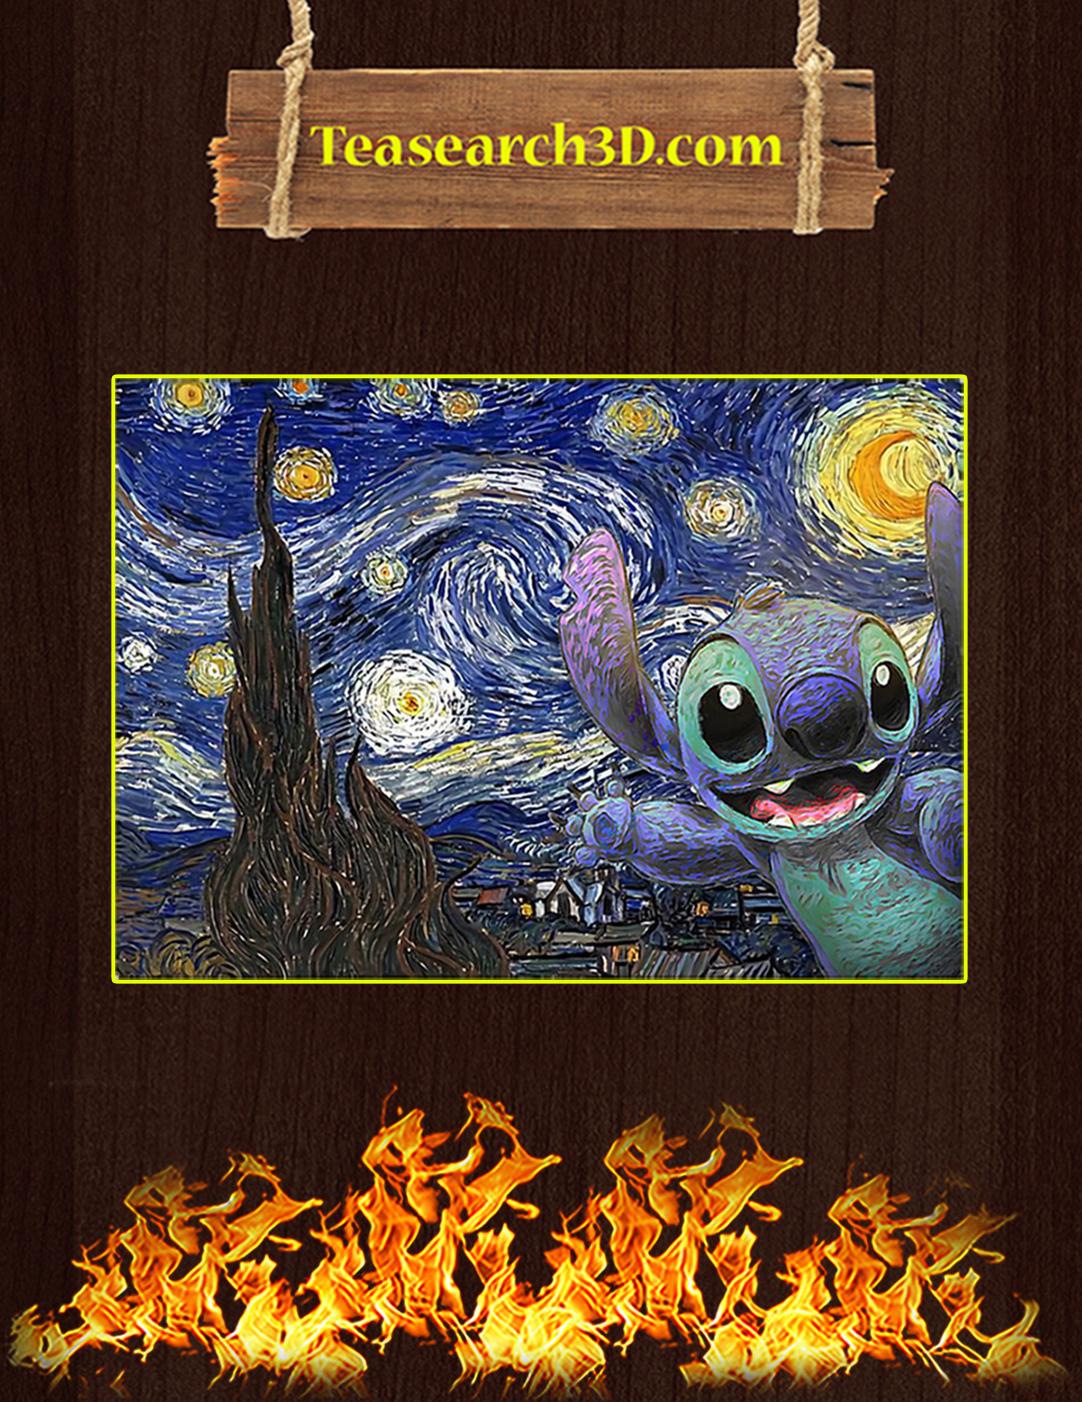 Stitch starry night poster A2